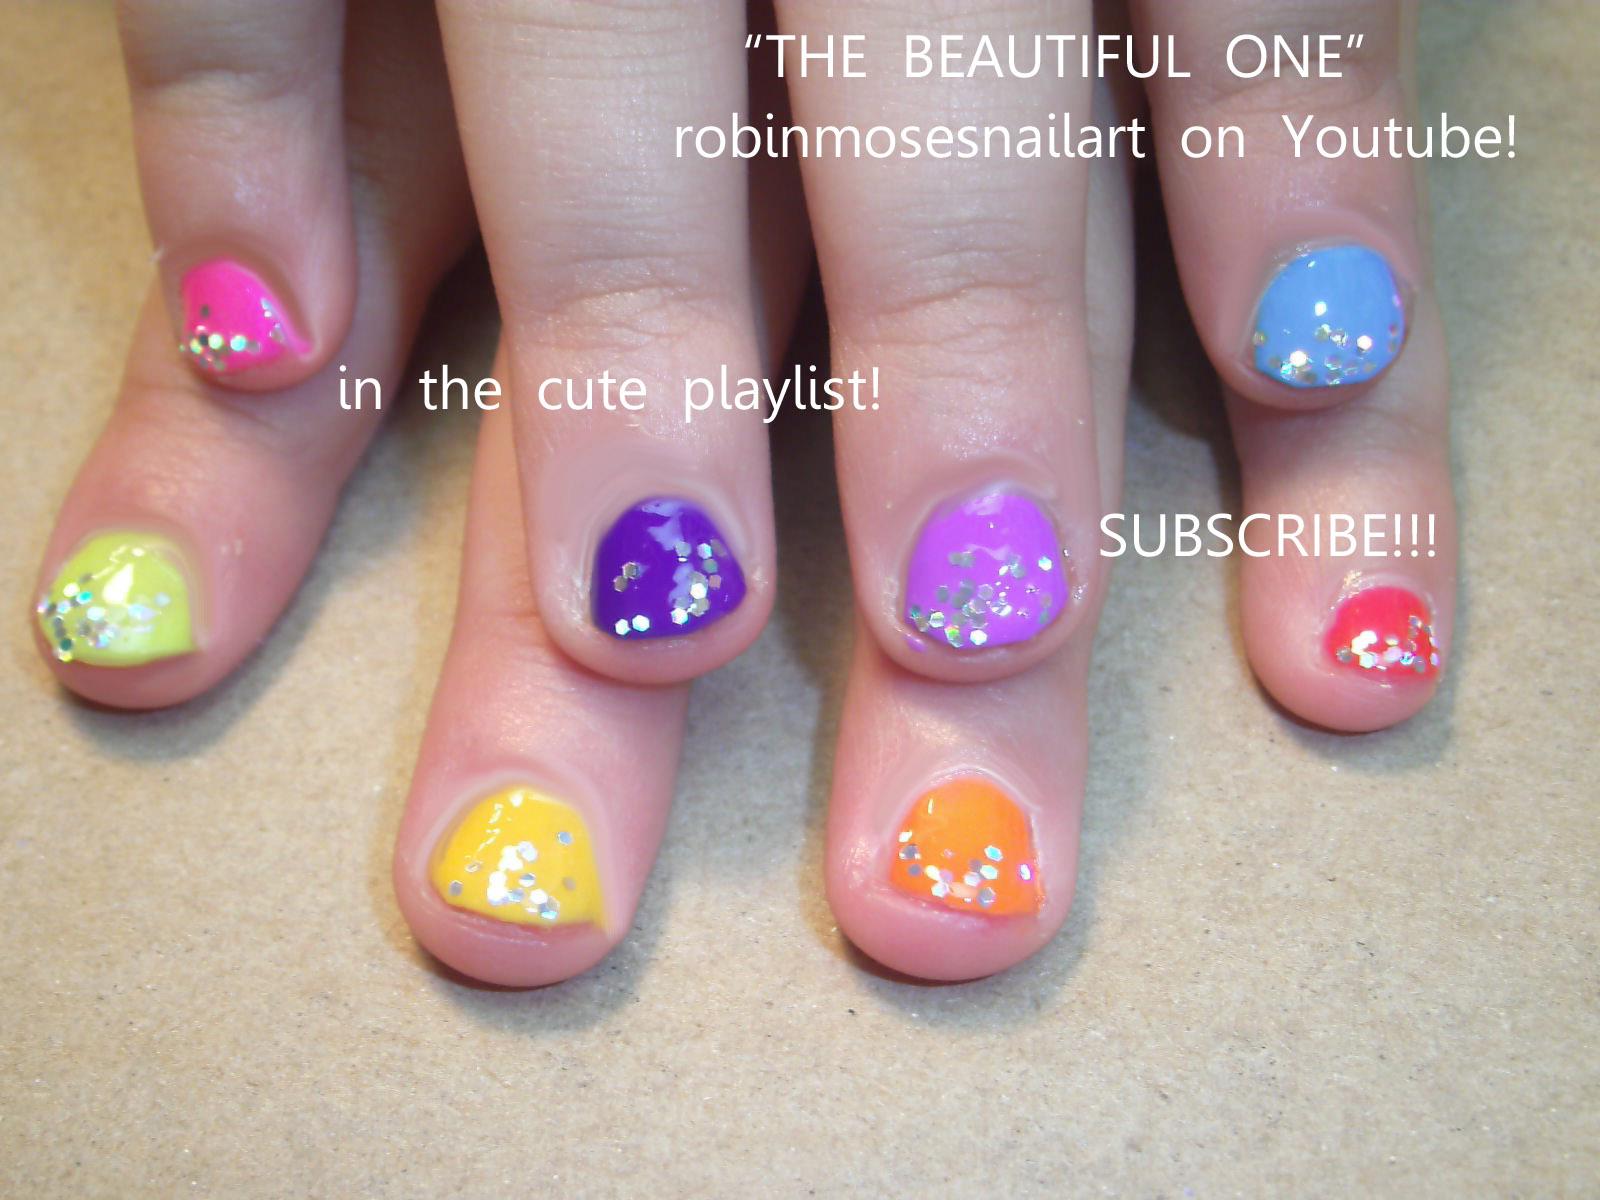 cute nail designs for little girls - Little Girl Nail Design Ideas